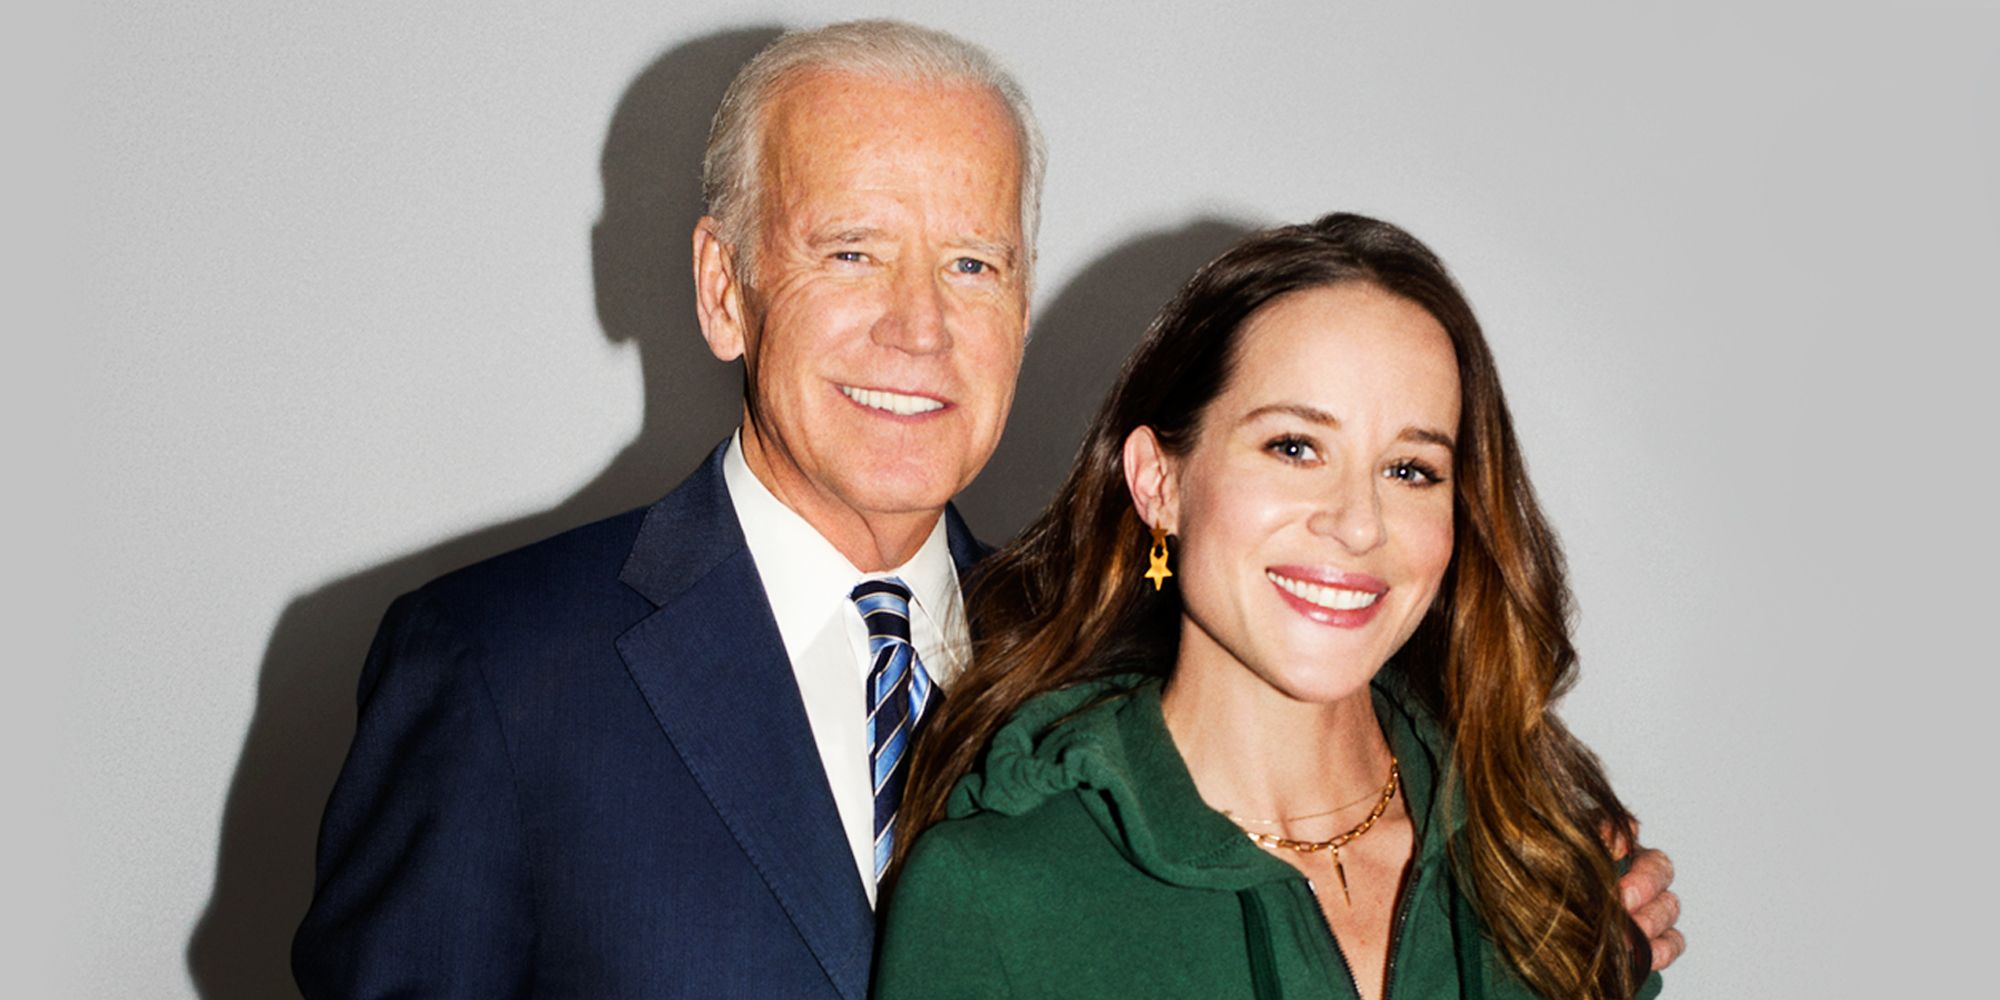 Joe Biden S Daughter S Clothing Line Livelihood Ashley Biden S New Clothing Line